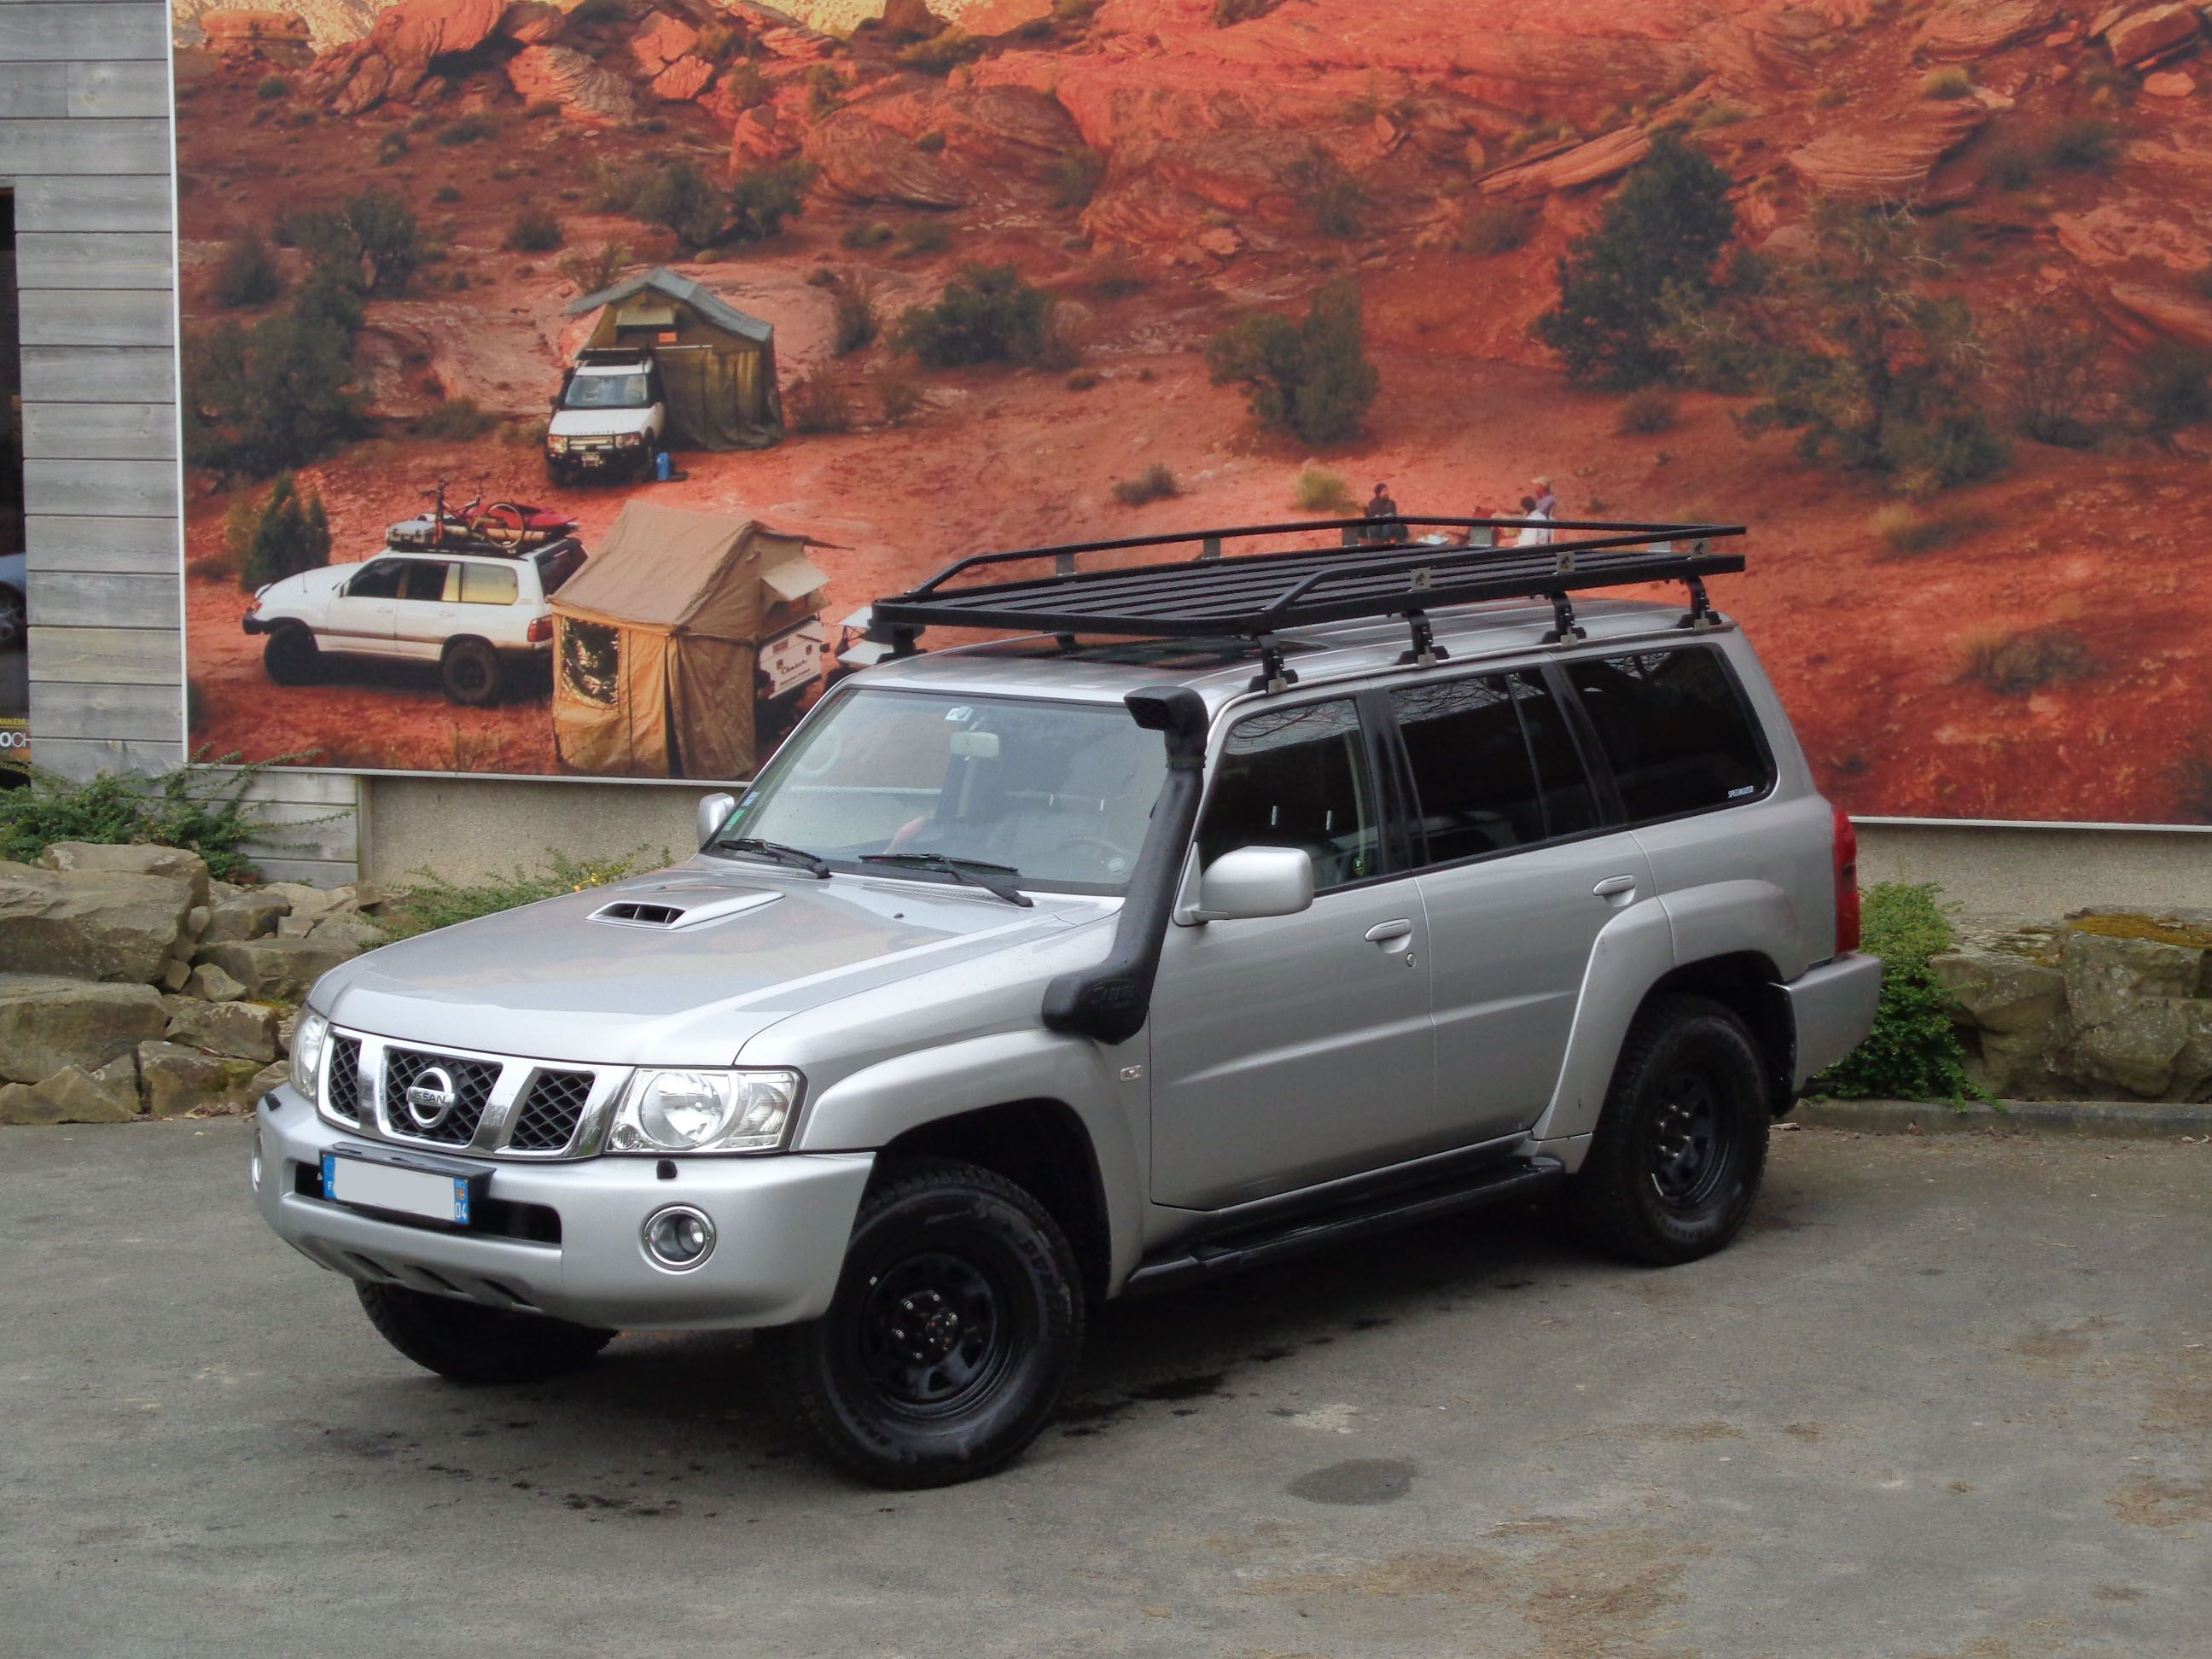 Tembo 4x4 Roof Rack On A Nissan Patrol Nissan Patrol Nissan Automobile Companies